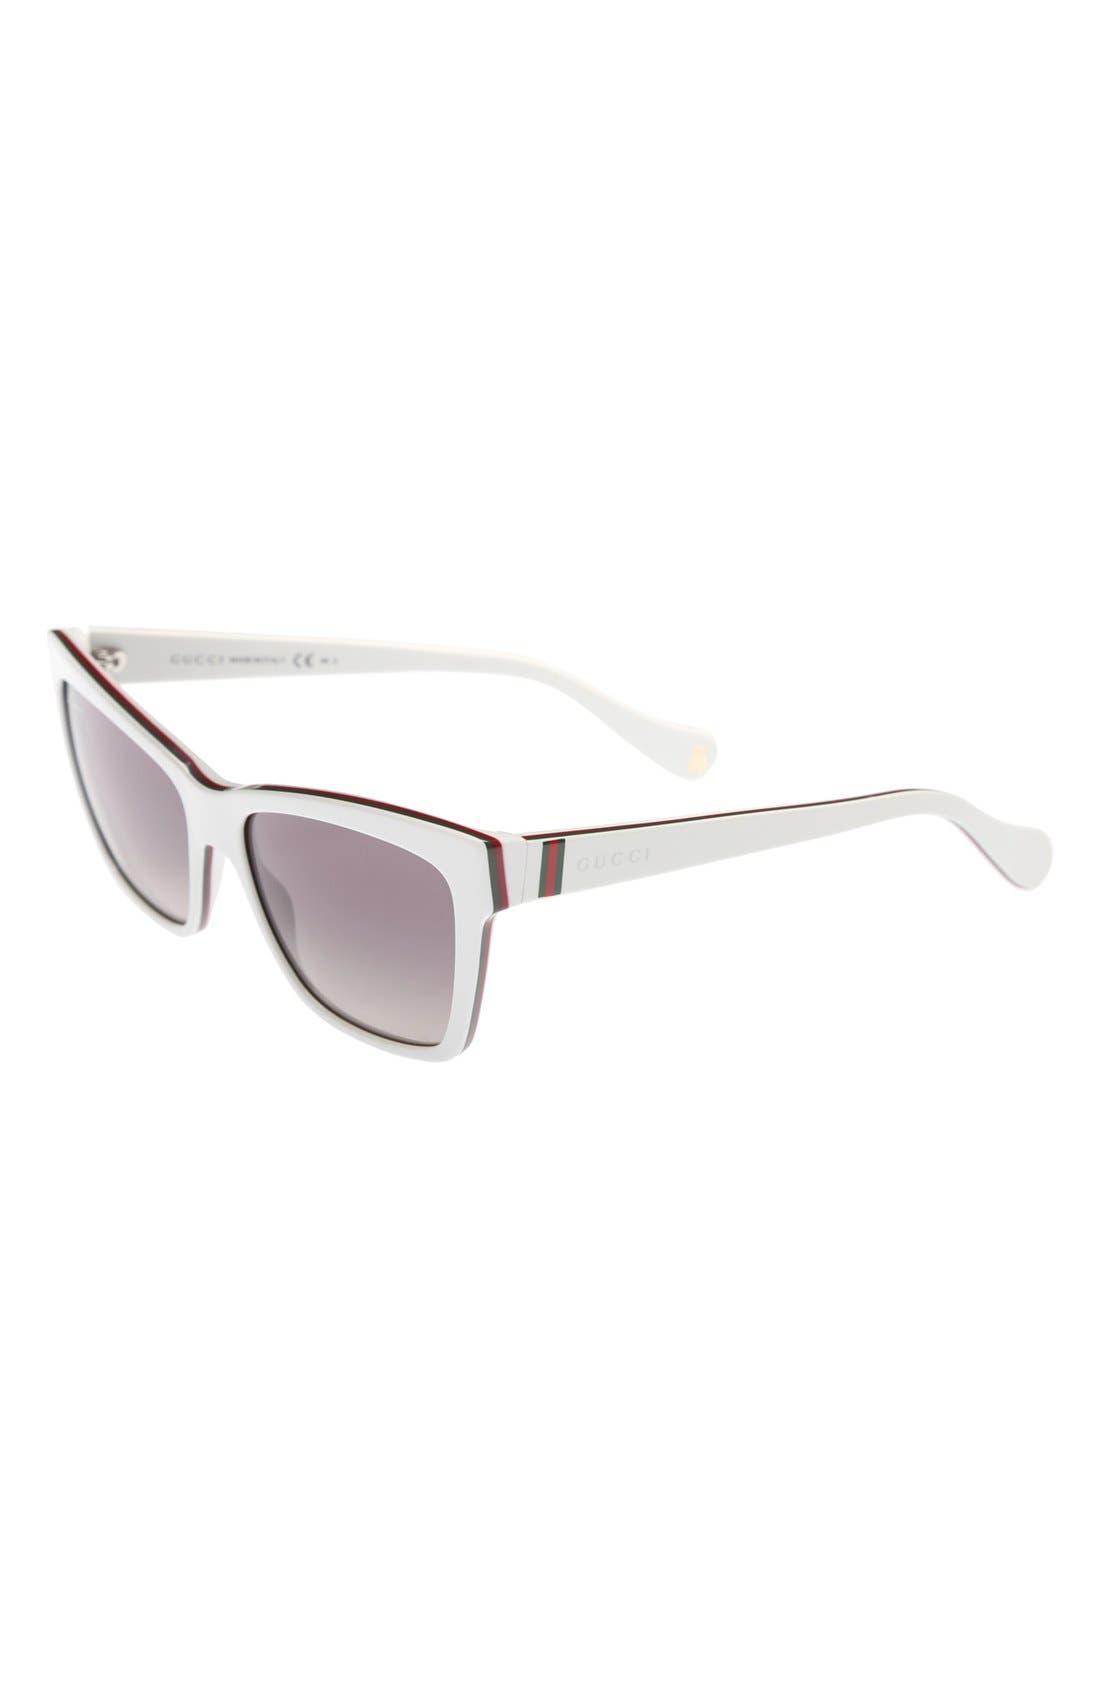 Alternate Image 1 Selected - Gucci 50mm Retro Sunglasses (Girls)